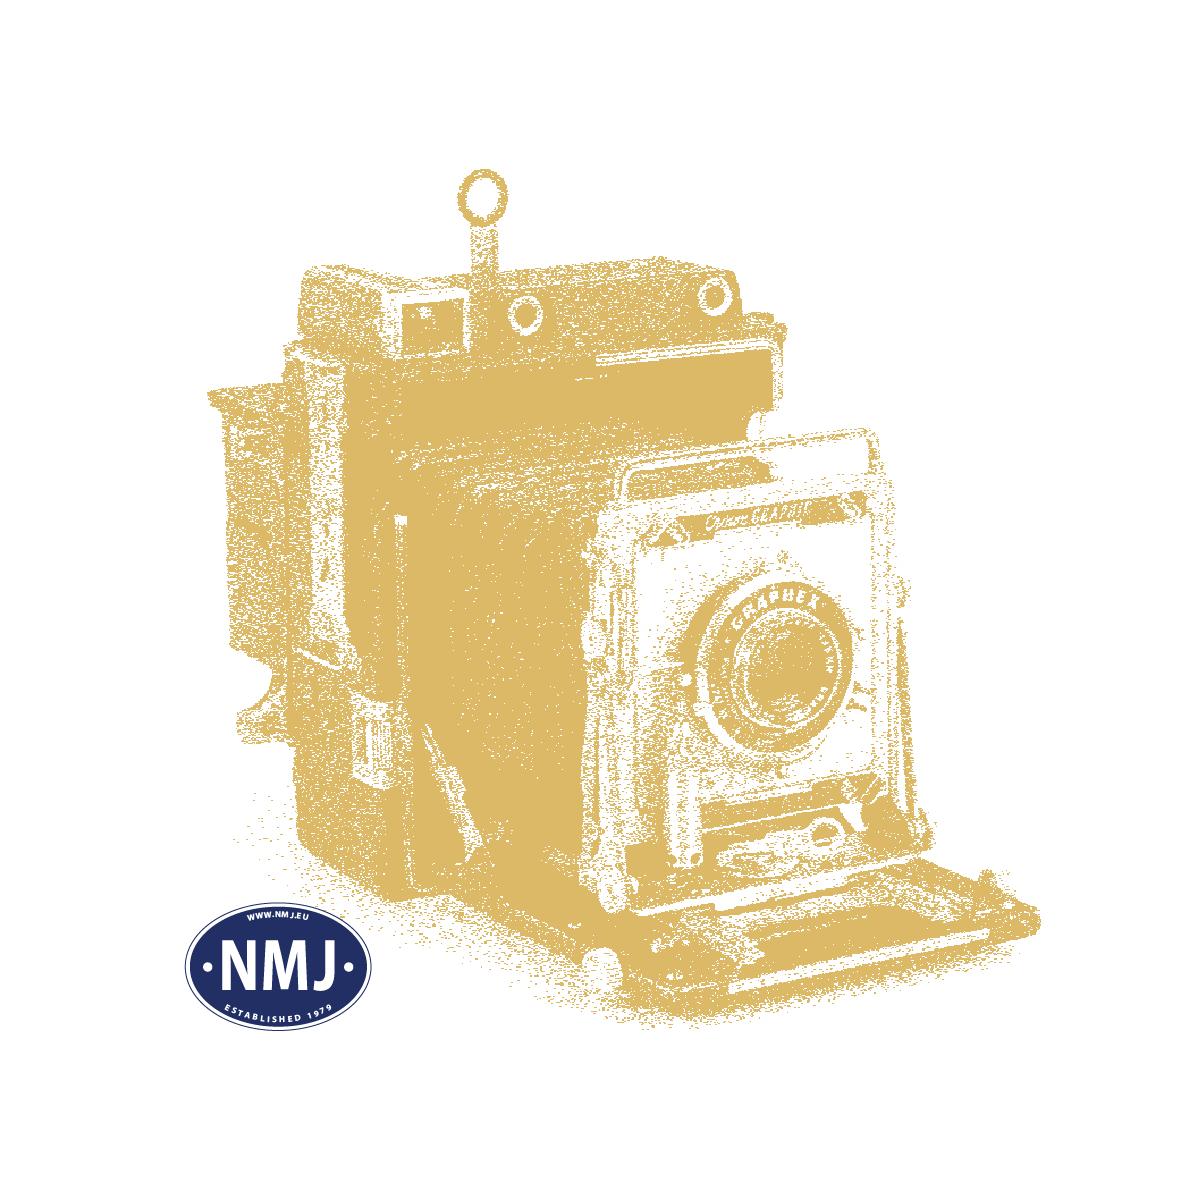 NMJ0G4-6 - NMJ Superline NSB Gbkls 20 76 158 5889-0, 0 Gauge